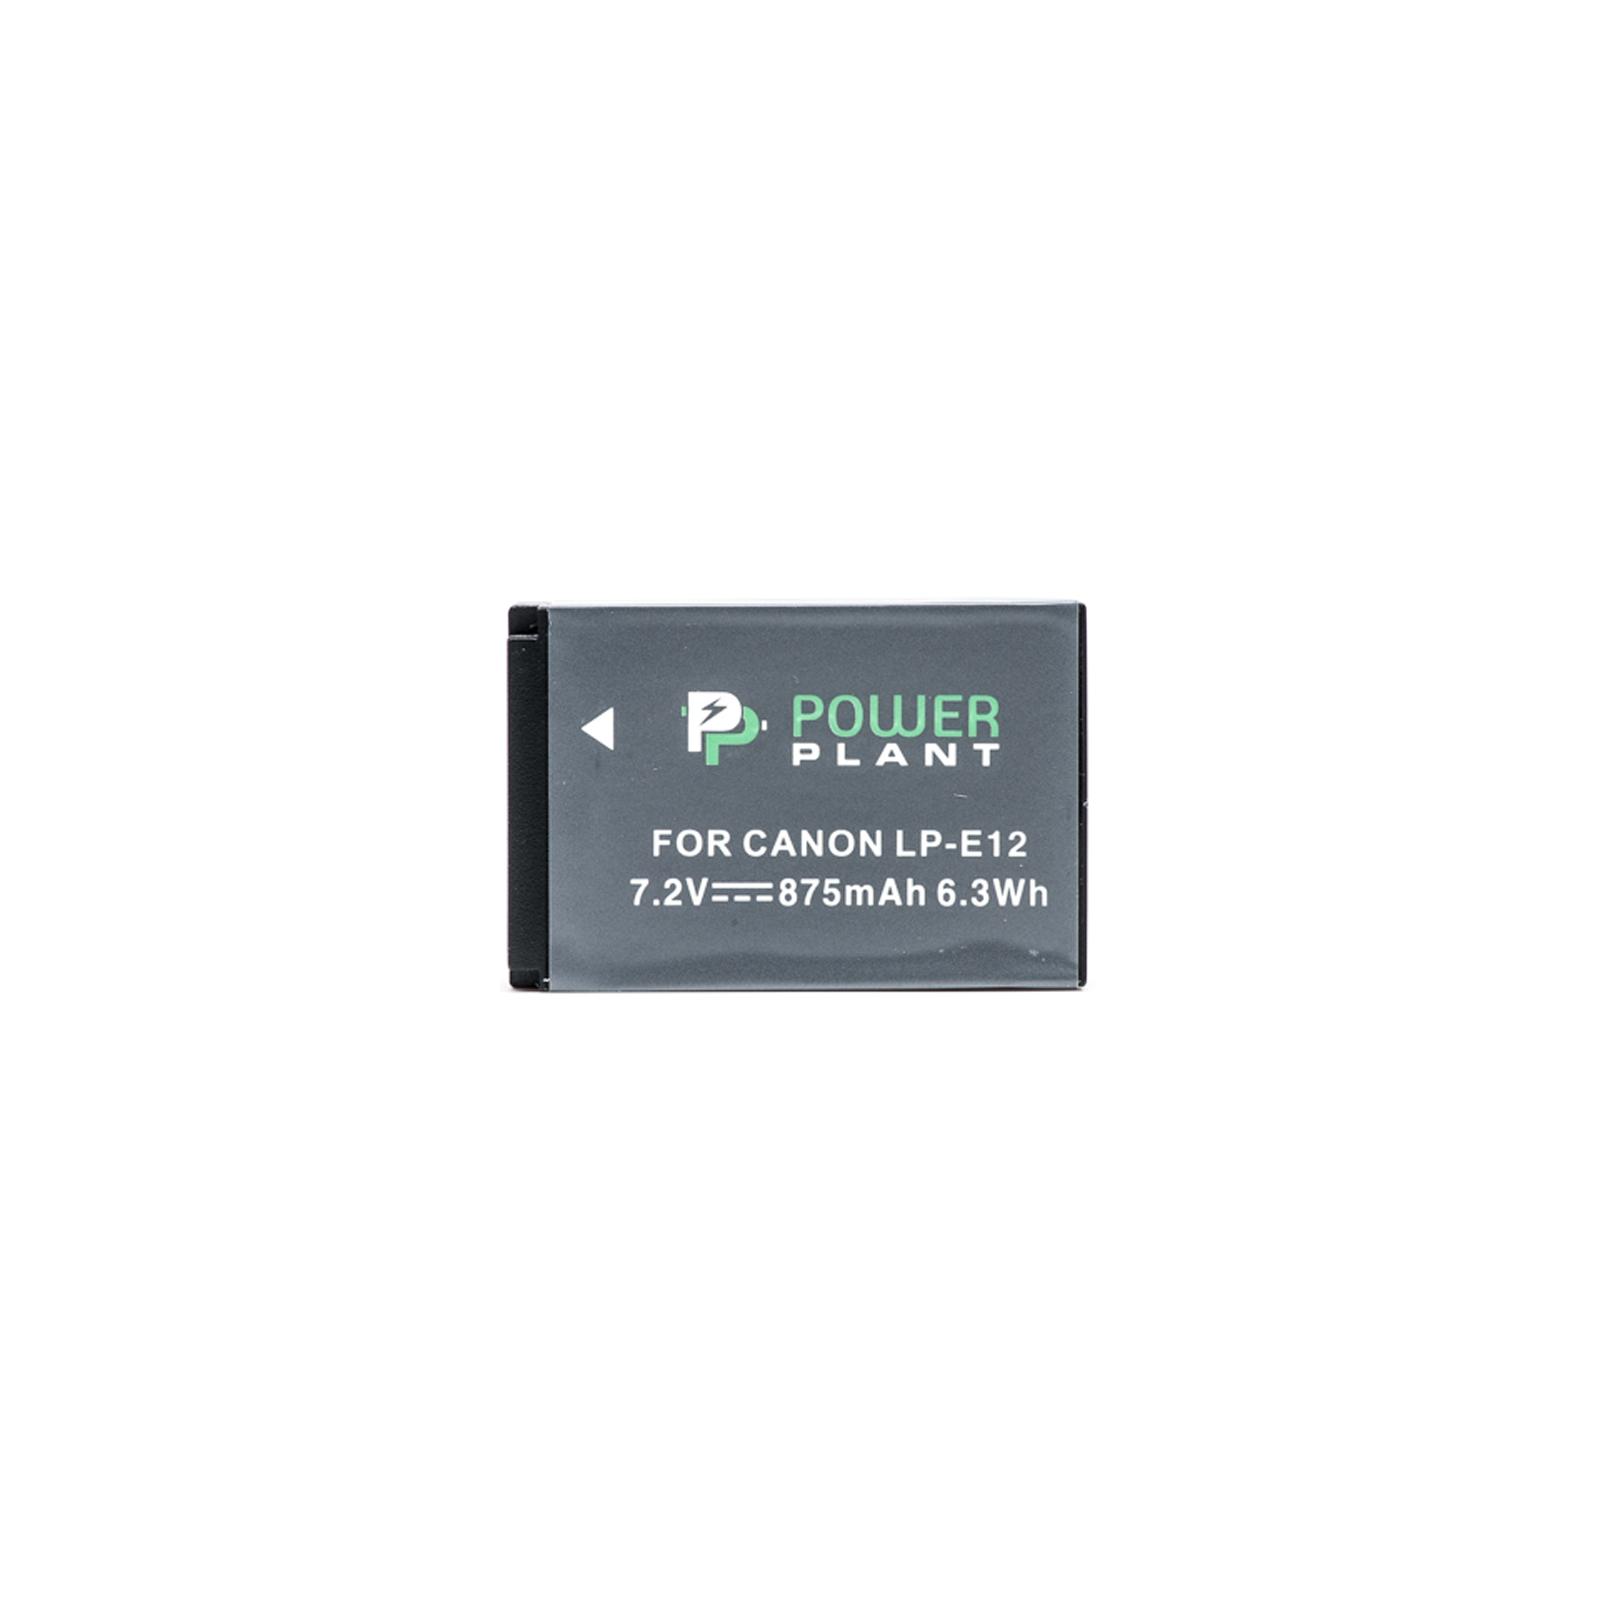 Аккумулятор к фото/видео PowerPlant Canon LP-E12 (DV00DV1311) изображение 2